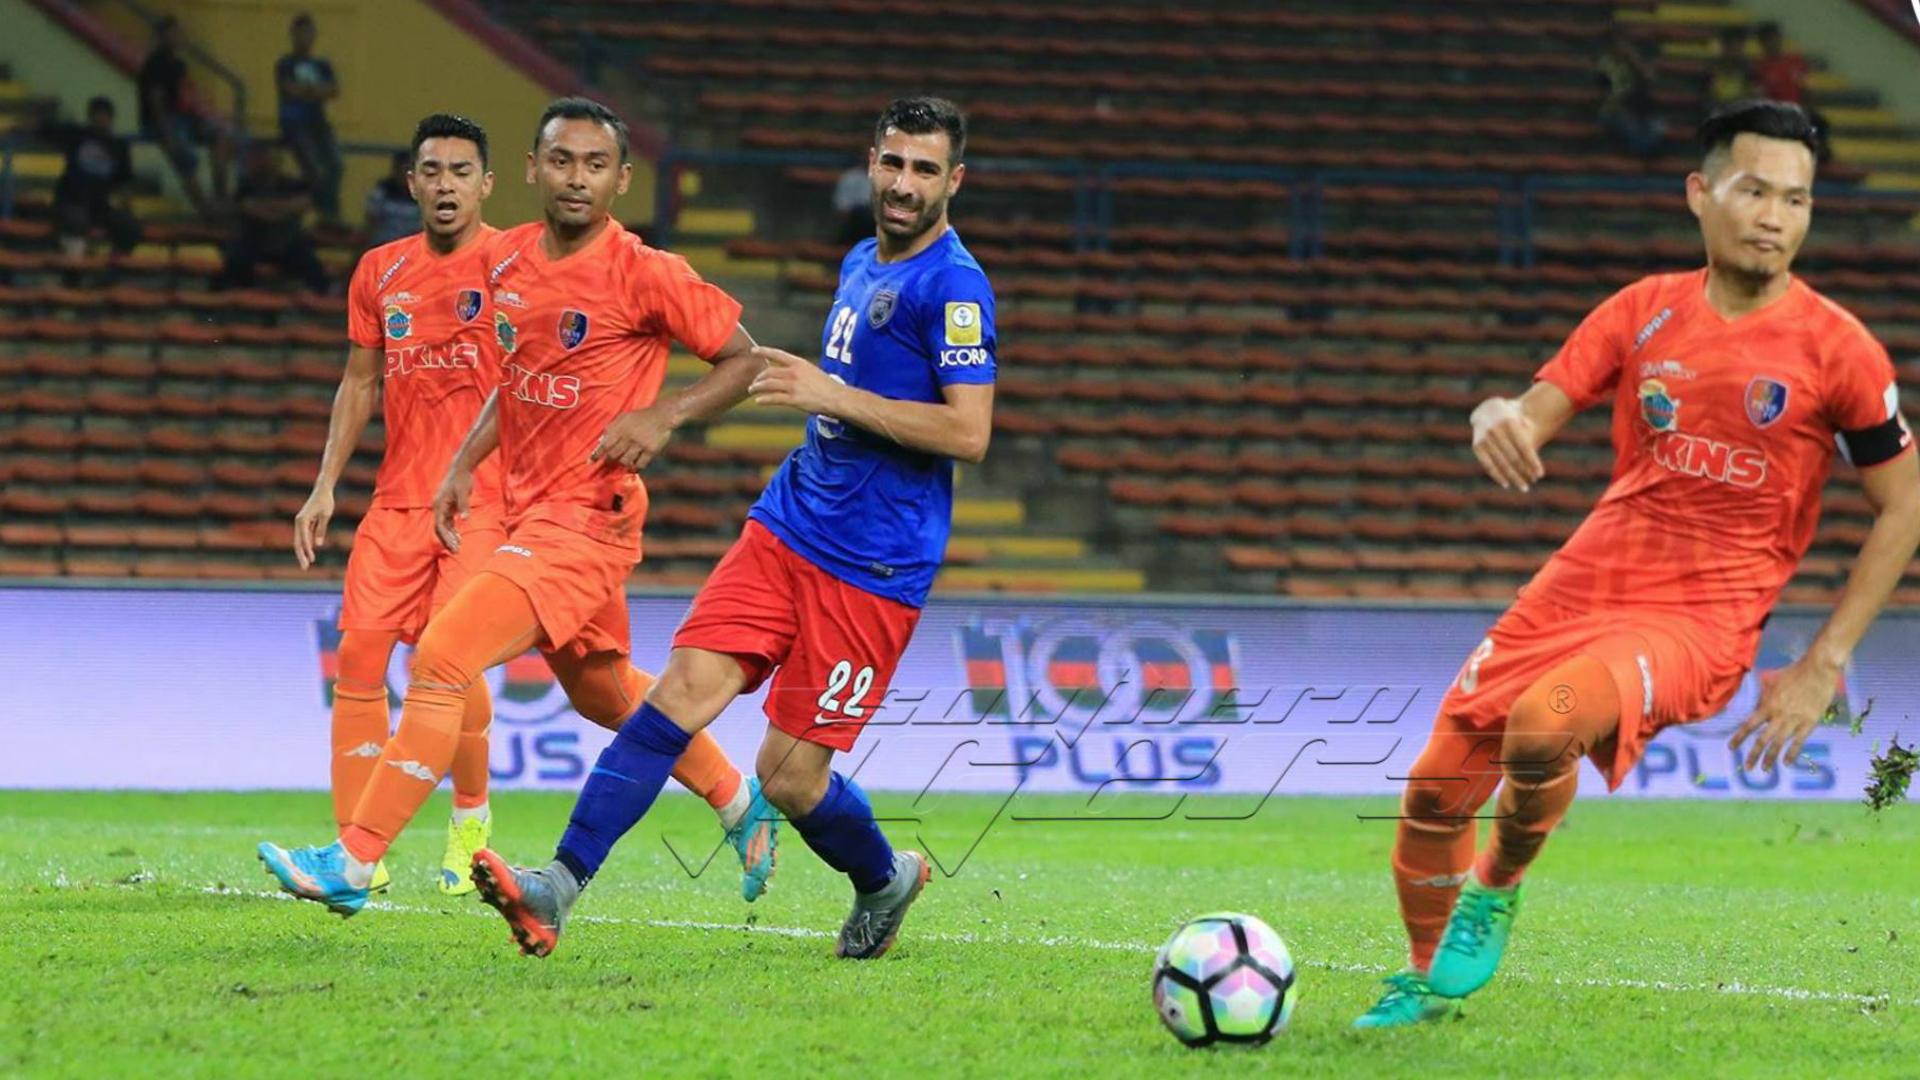 Ghaddar, Johor Darul Ta'zim, Fauzan Dzulkifli, PKNS, Super League, 25/05/2017